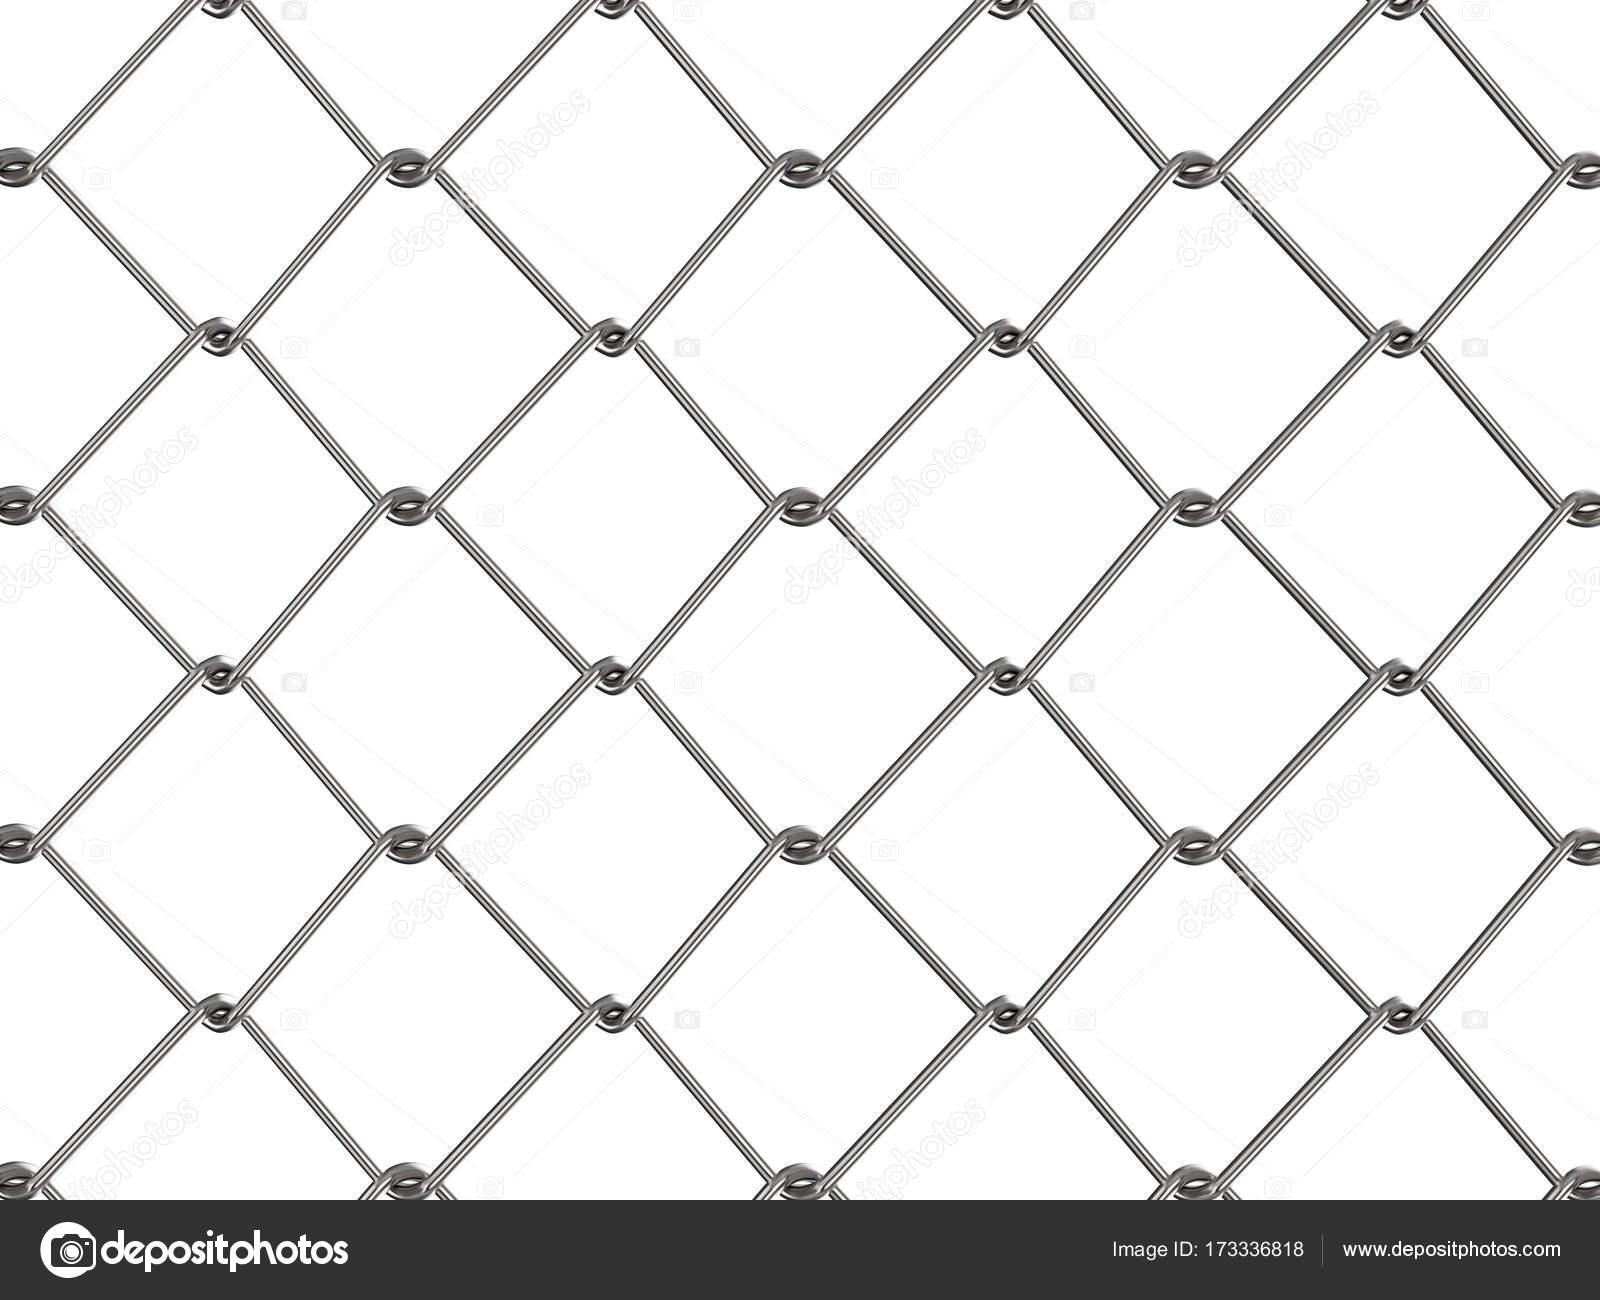 Maschendrahtzaun oder Kette Zaun — Stockfoto © phonlamai #173336818